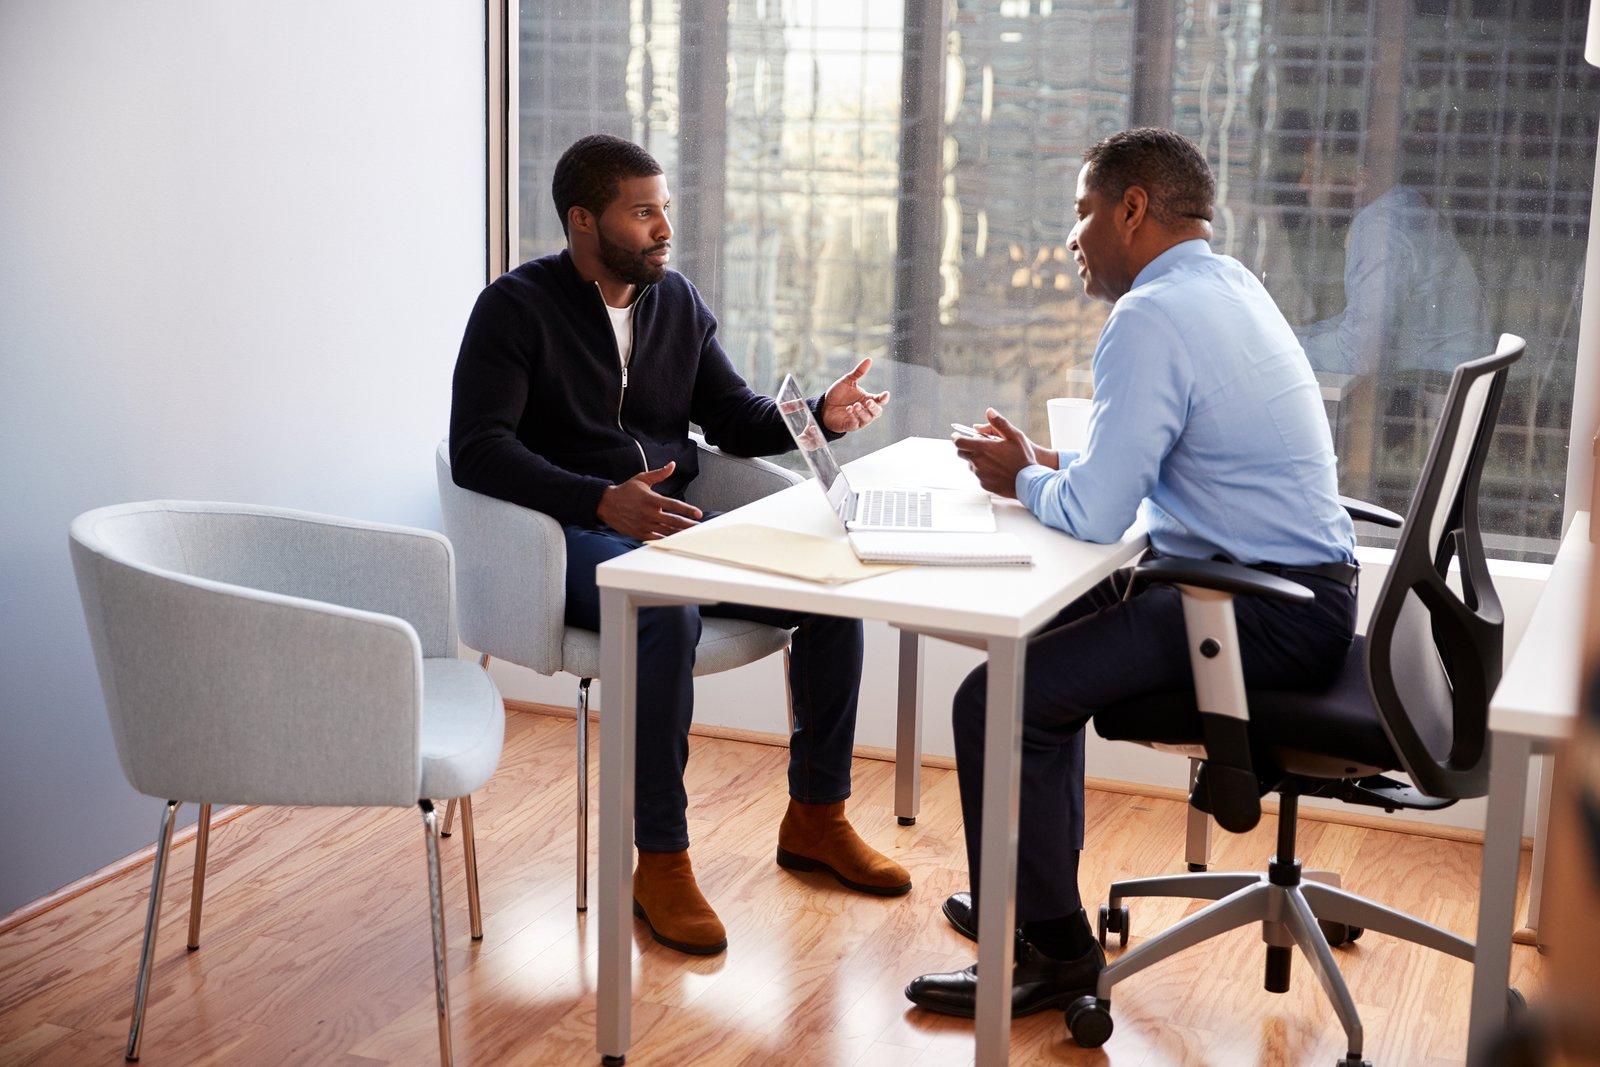 bigstock-Man-Meeting-With-Male-Financia-286367530